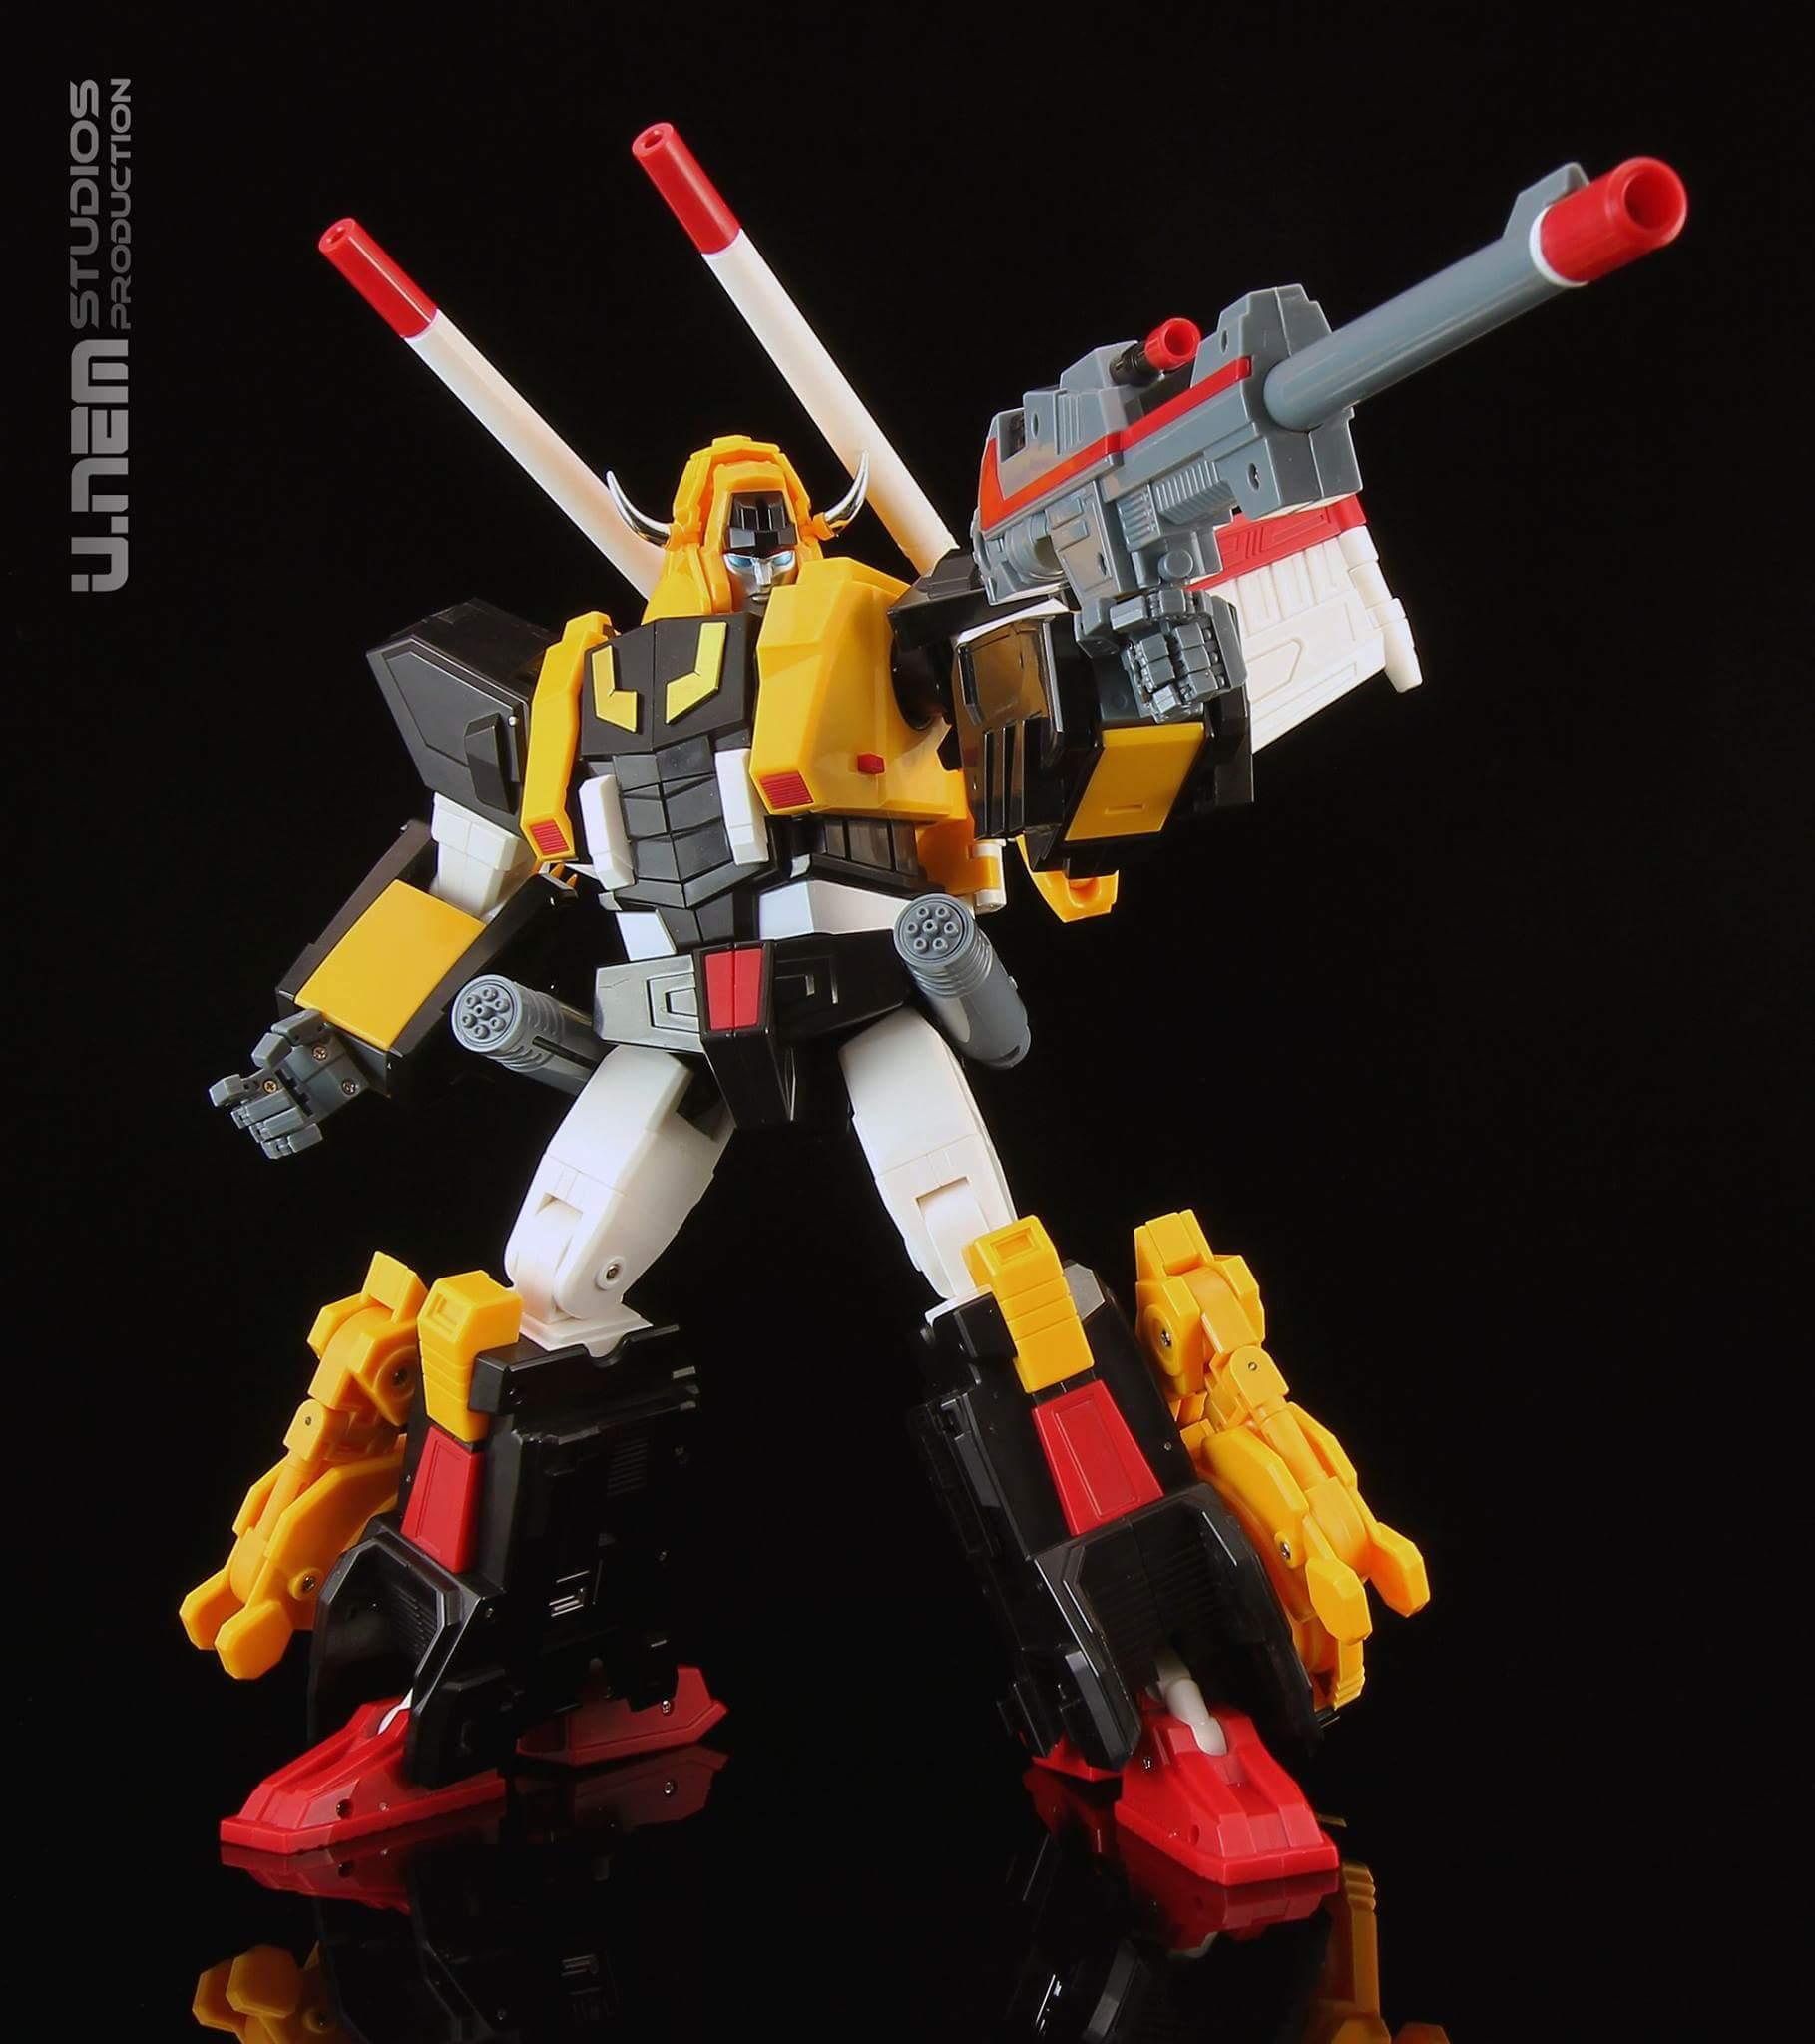 [KFC Toys] Produit Tiers - Jouet Phase 8-A Simba - aka Victory Leo (Transformers Victory) - Page 2 HTbZN0Pl